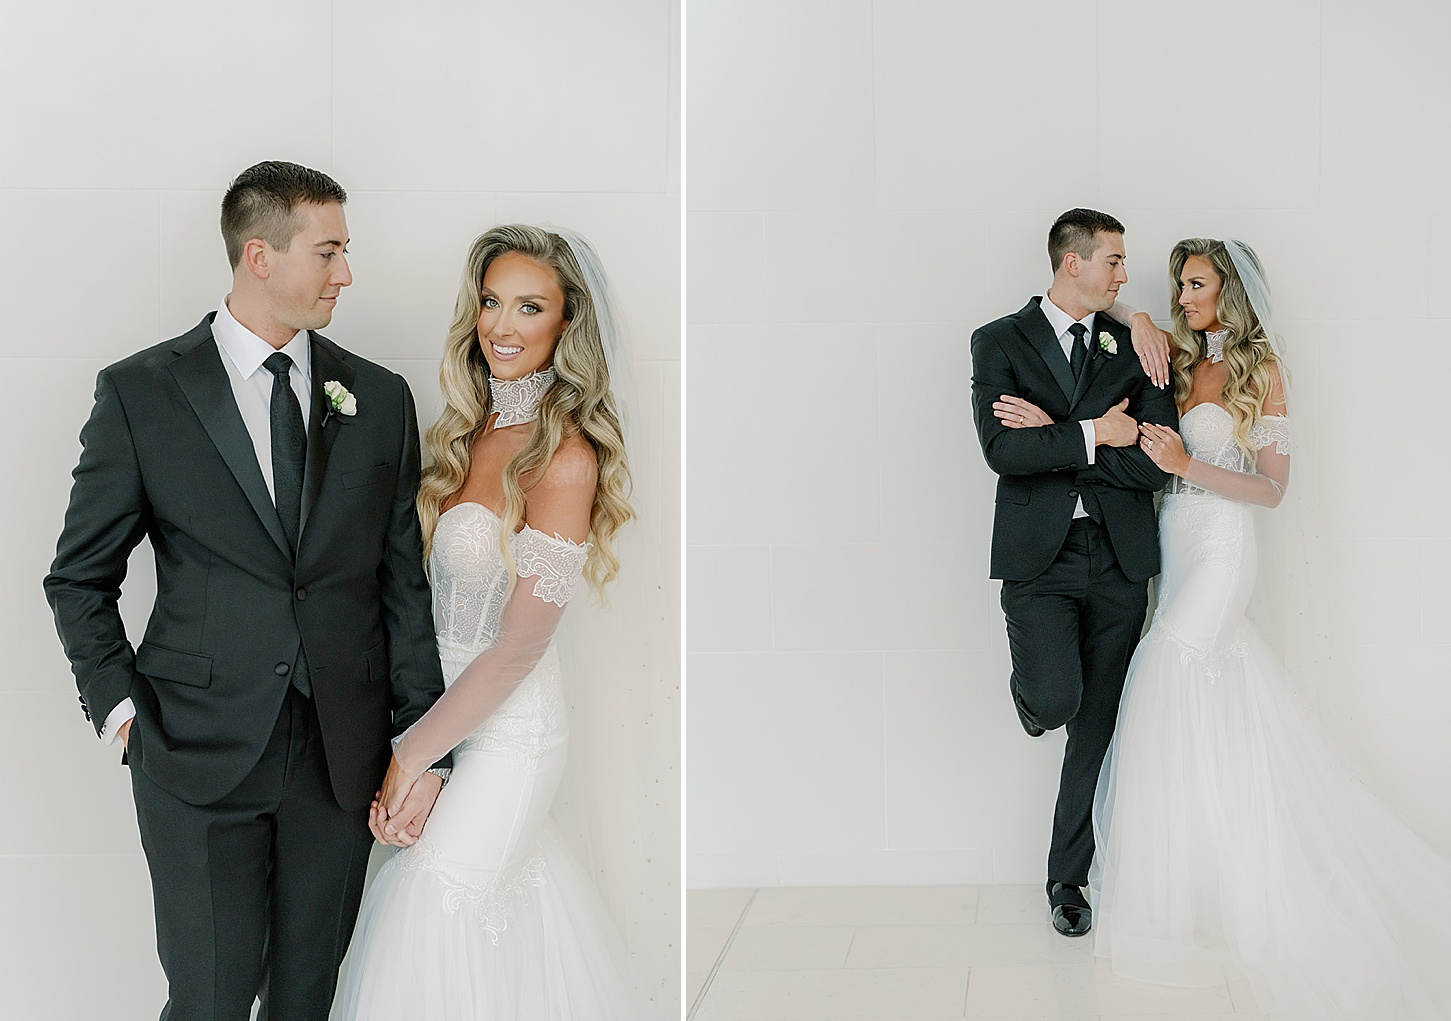 Atlantic City Wedding Photography Studio by Magdalena Studios Lexy Cha 0057